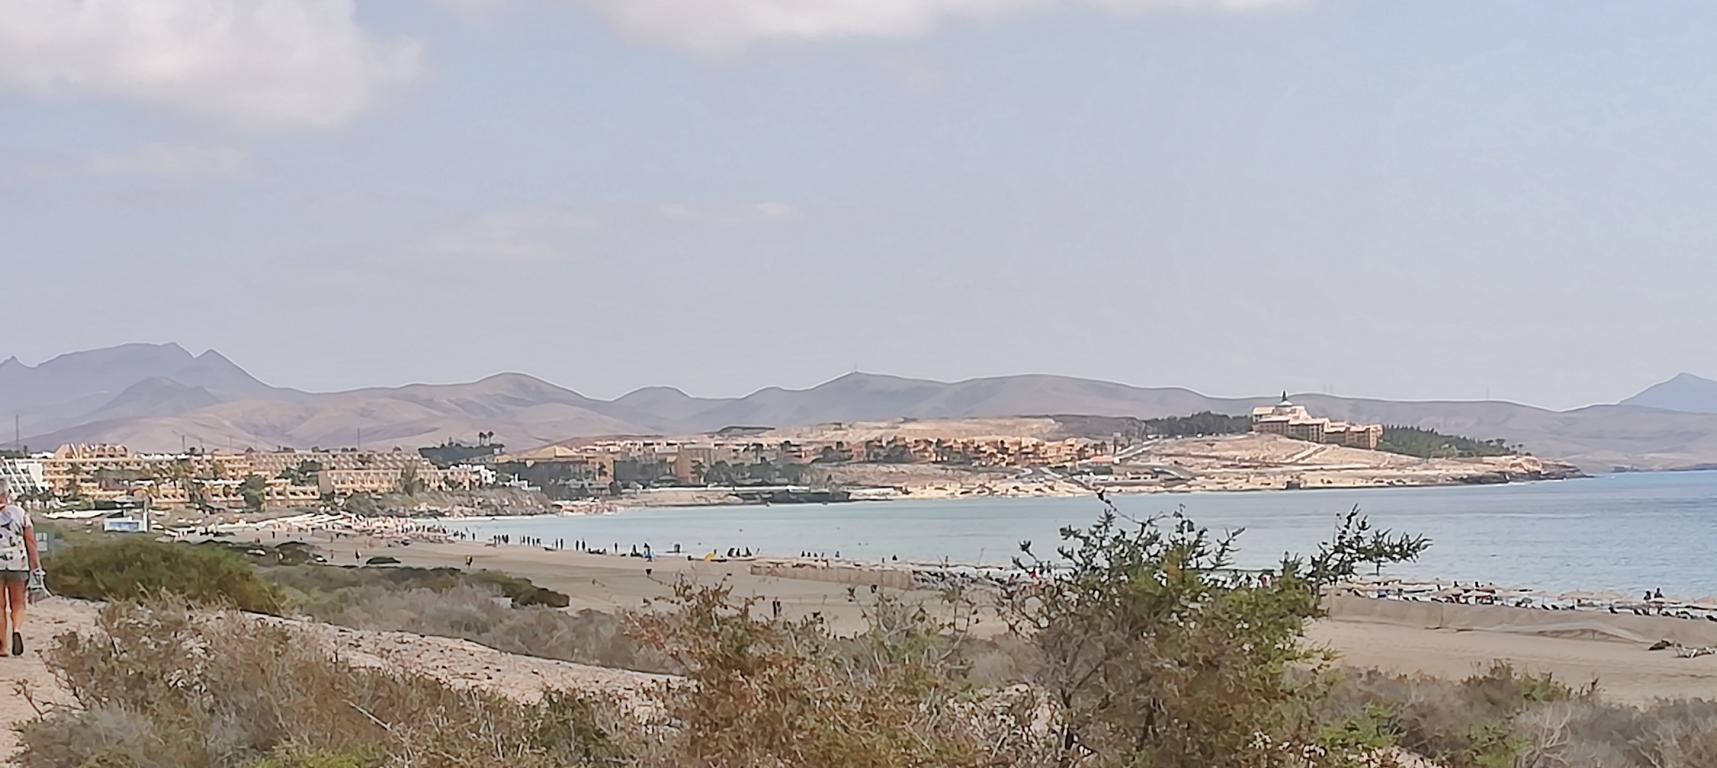 Fuerteventura 08 2018 (9)